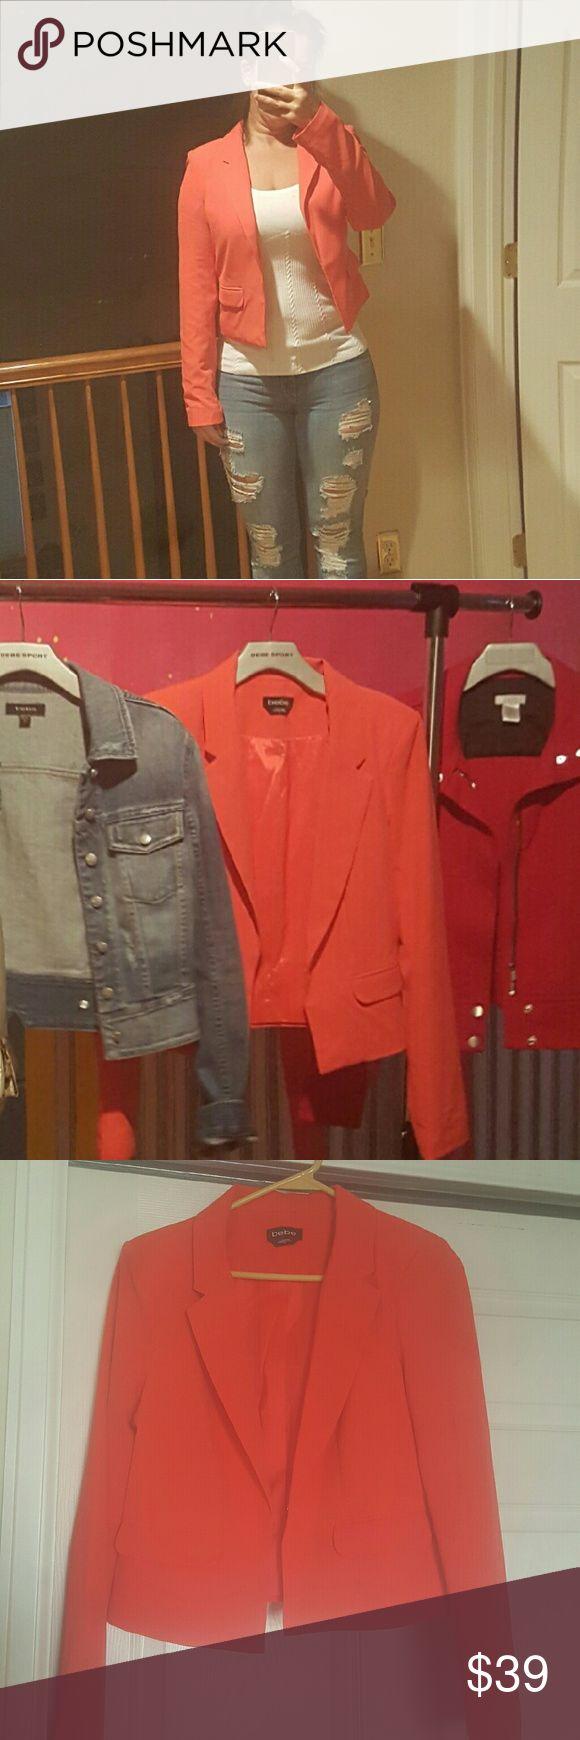 NWOT Bebe coral jacket NWOT Bebe coral jacket never worn bebe Jackets & Coats